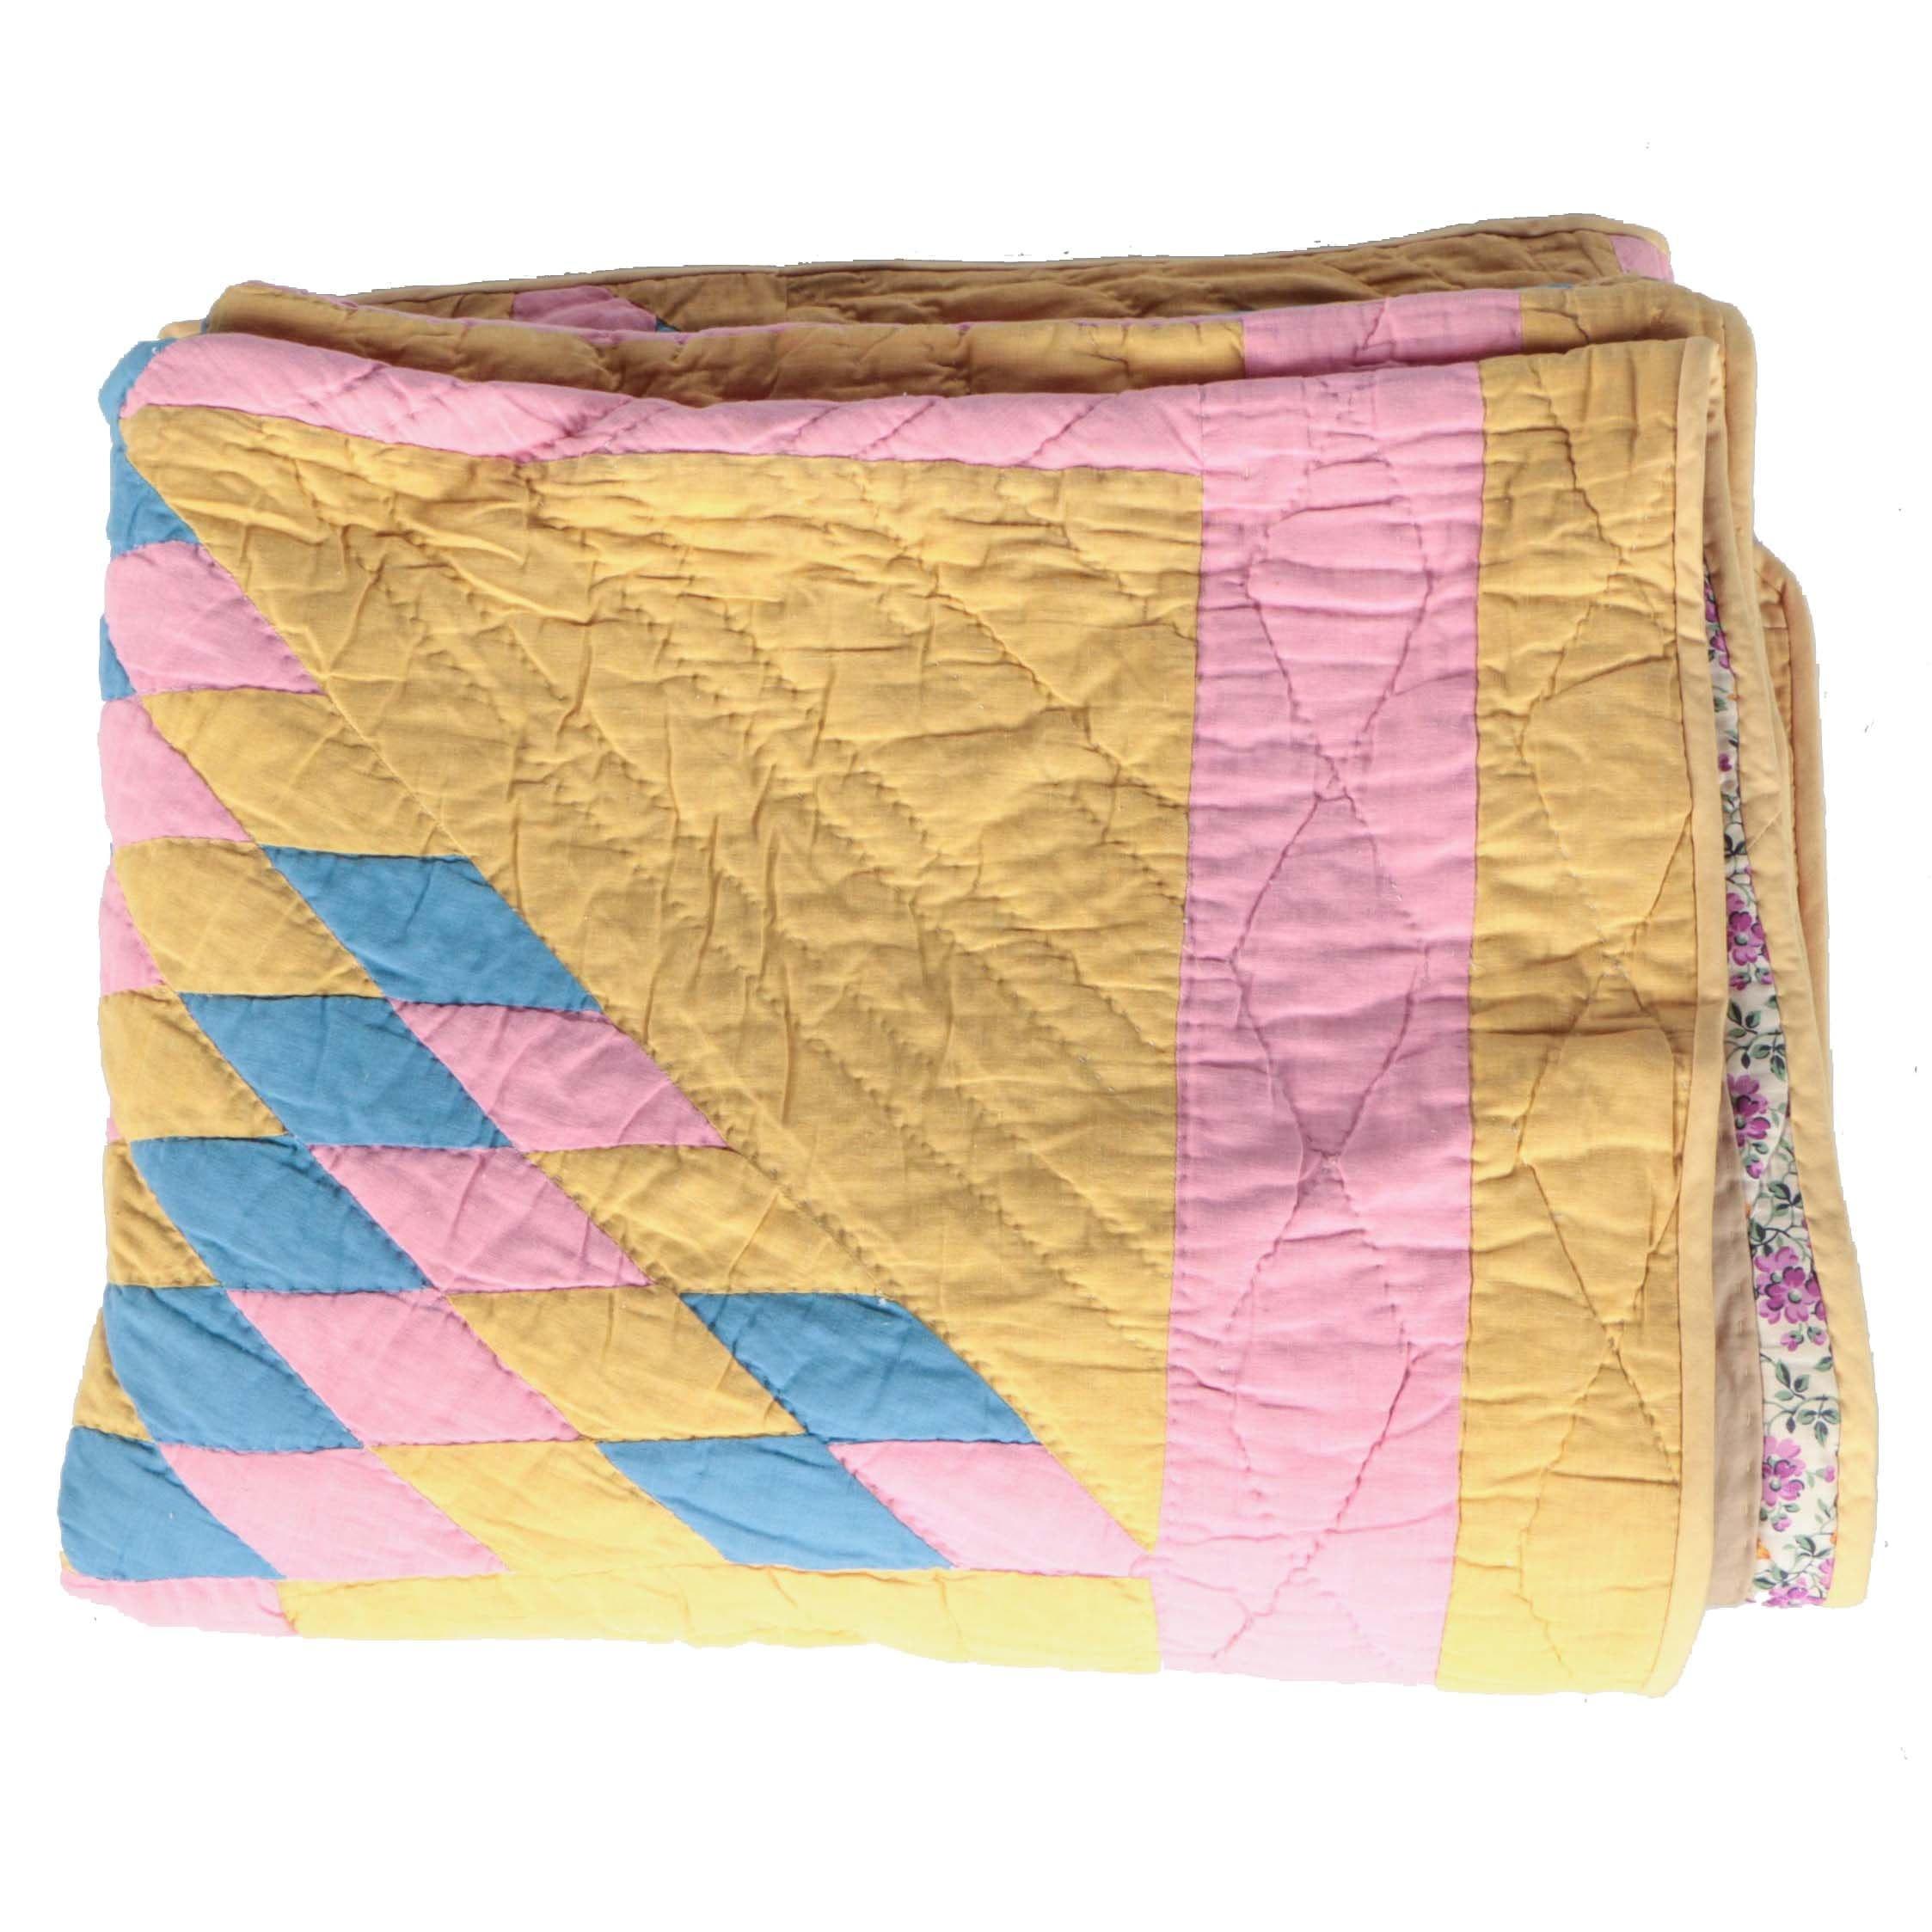 Lone Star Handmade Lap Quilt